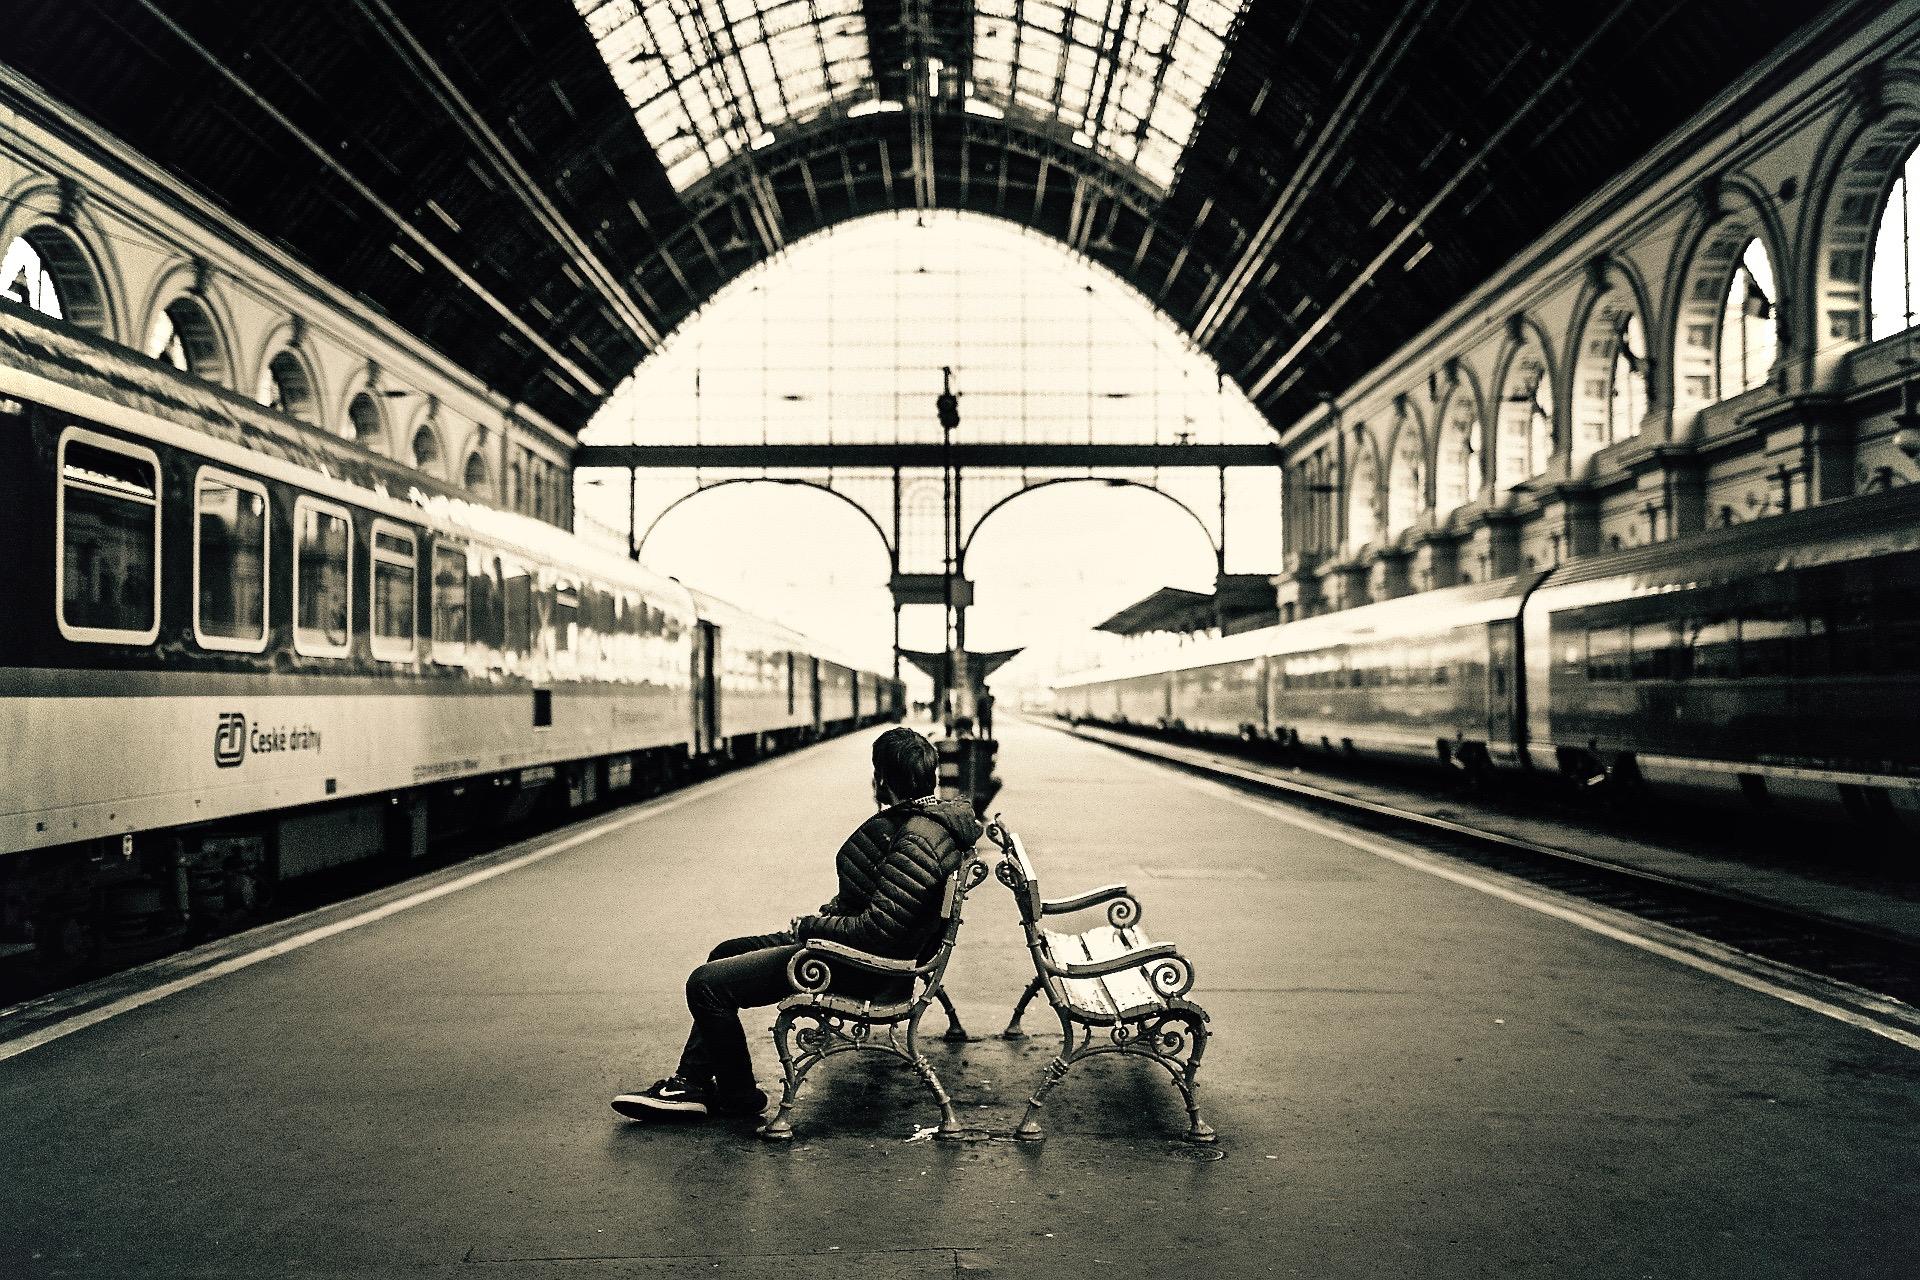 train-station-1868256_1920 (1)